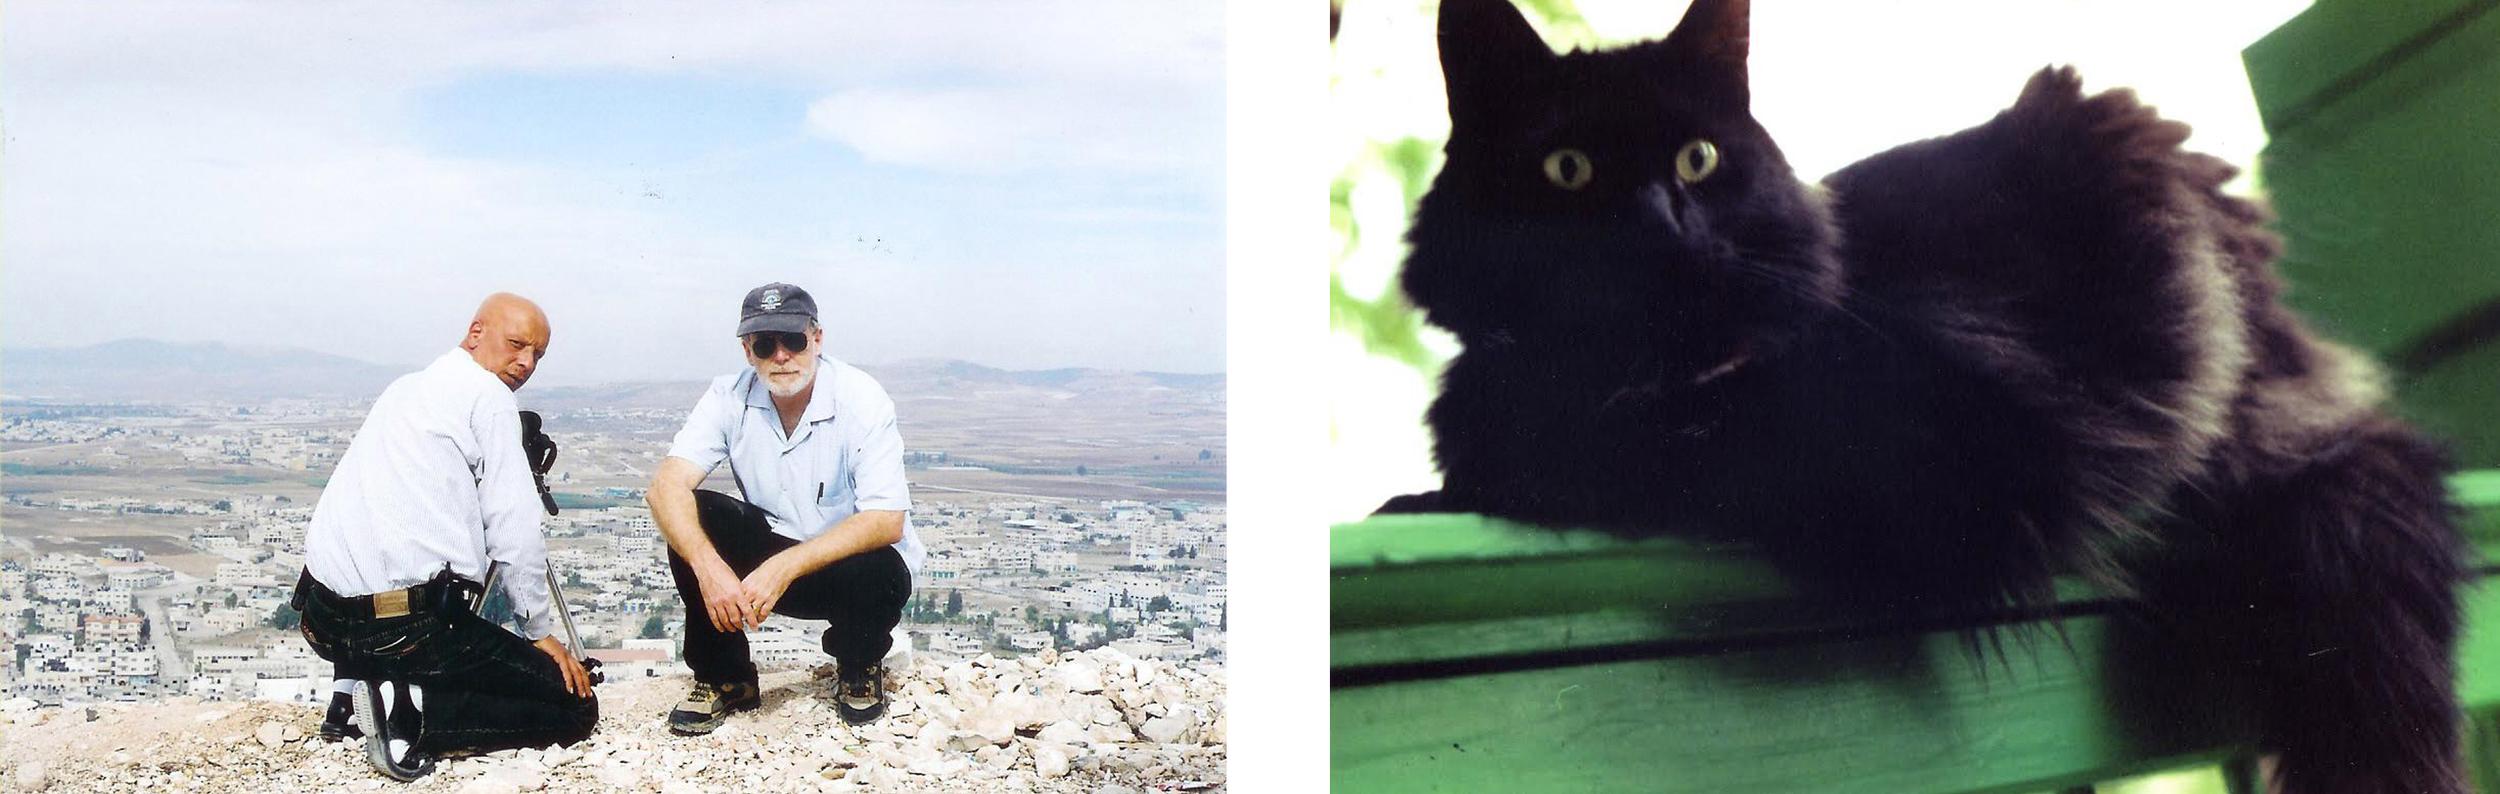 Samer Shallabi & James Cullingham                                Snowflake Wendel Cullingham, Vice President - Consumre & Corporate Relations (1994 - 2007)